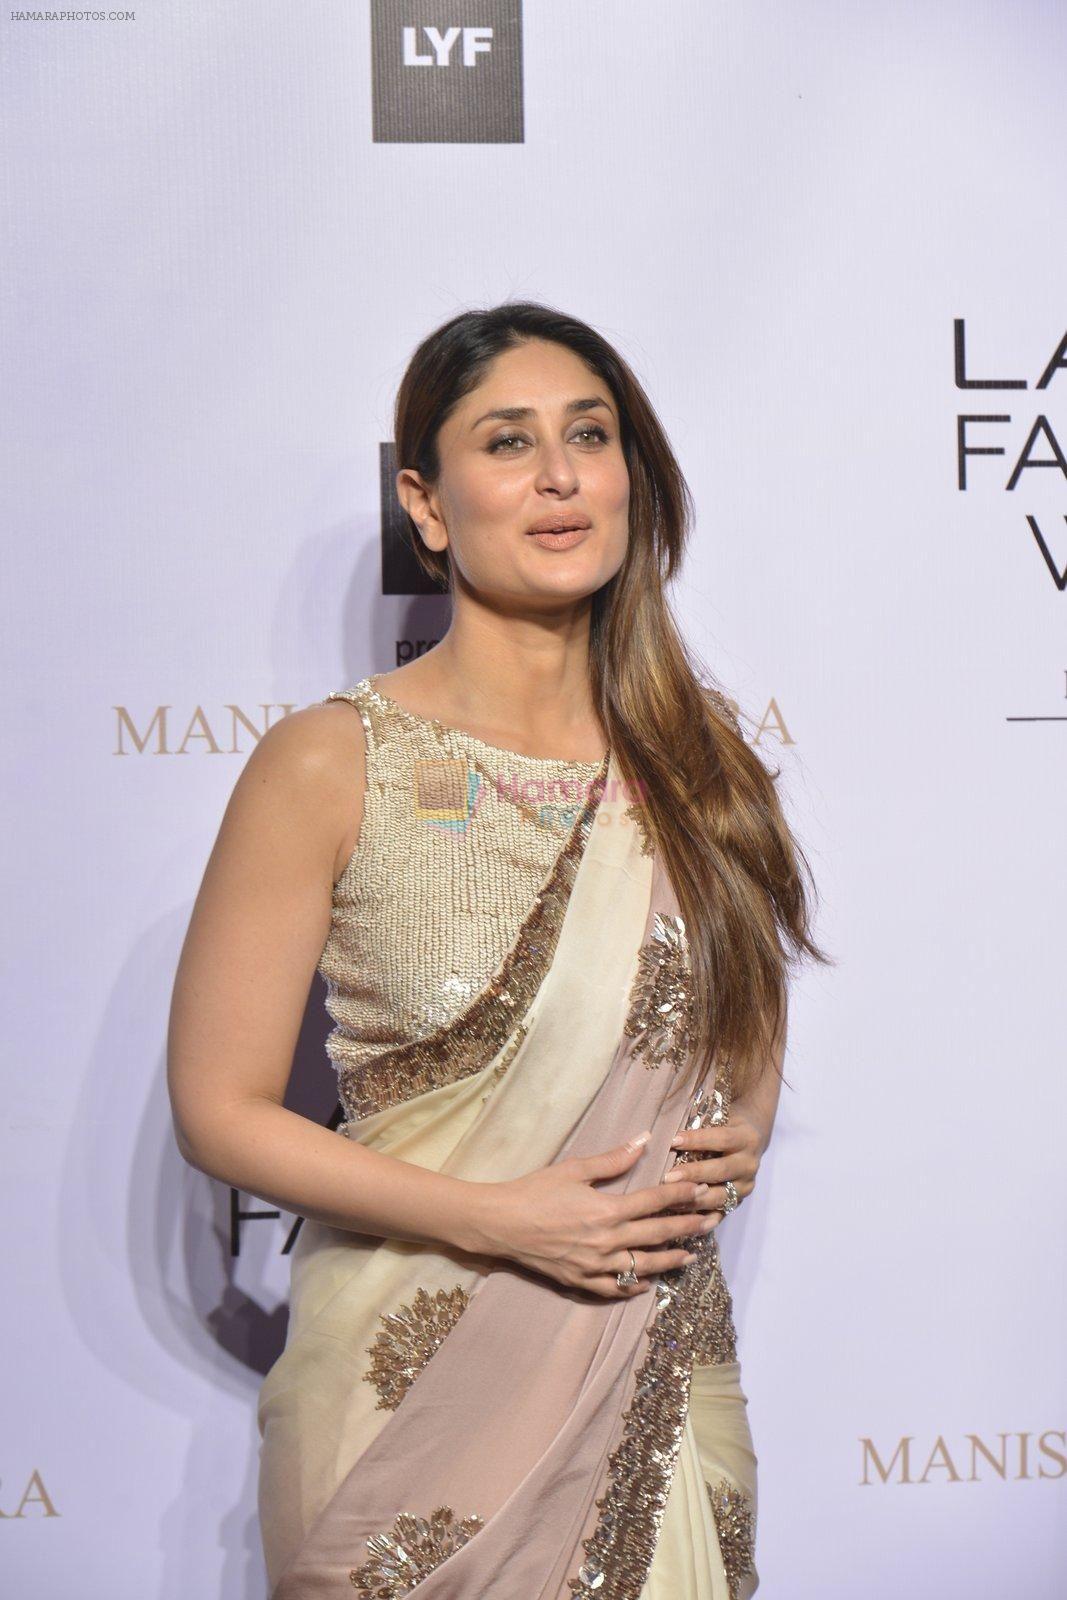 Kareena Kapoor At Lakme Manish Malhotra Show On 29th March 2016 Bollywood Dress Kareena Kapoor Saree Indian Bollywood Actress